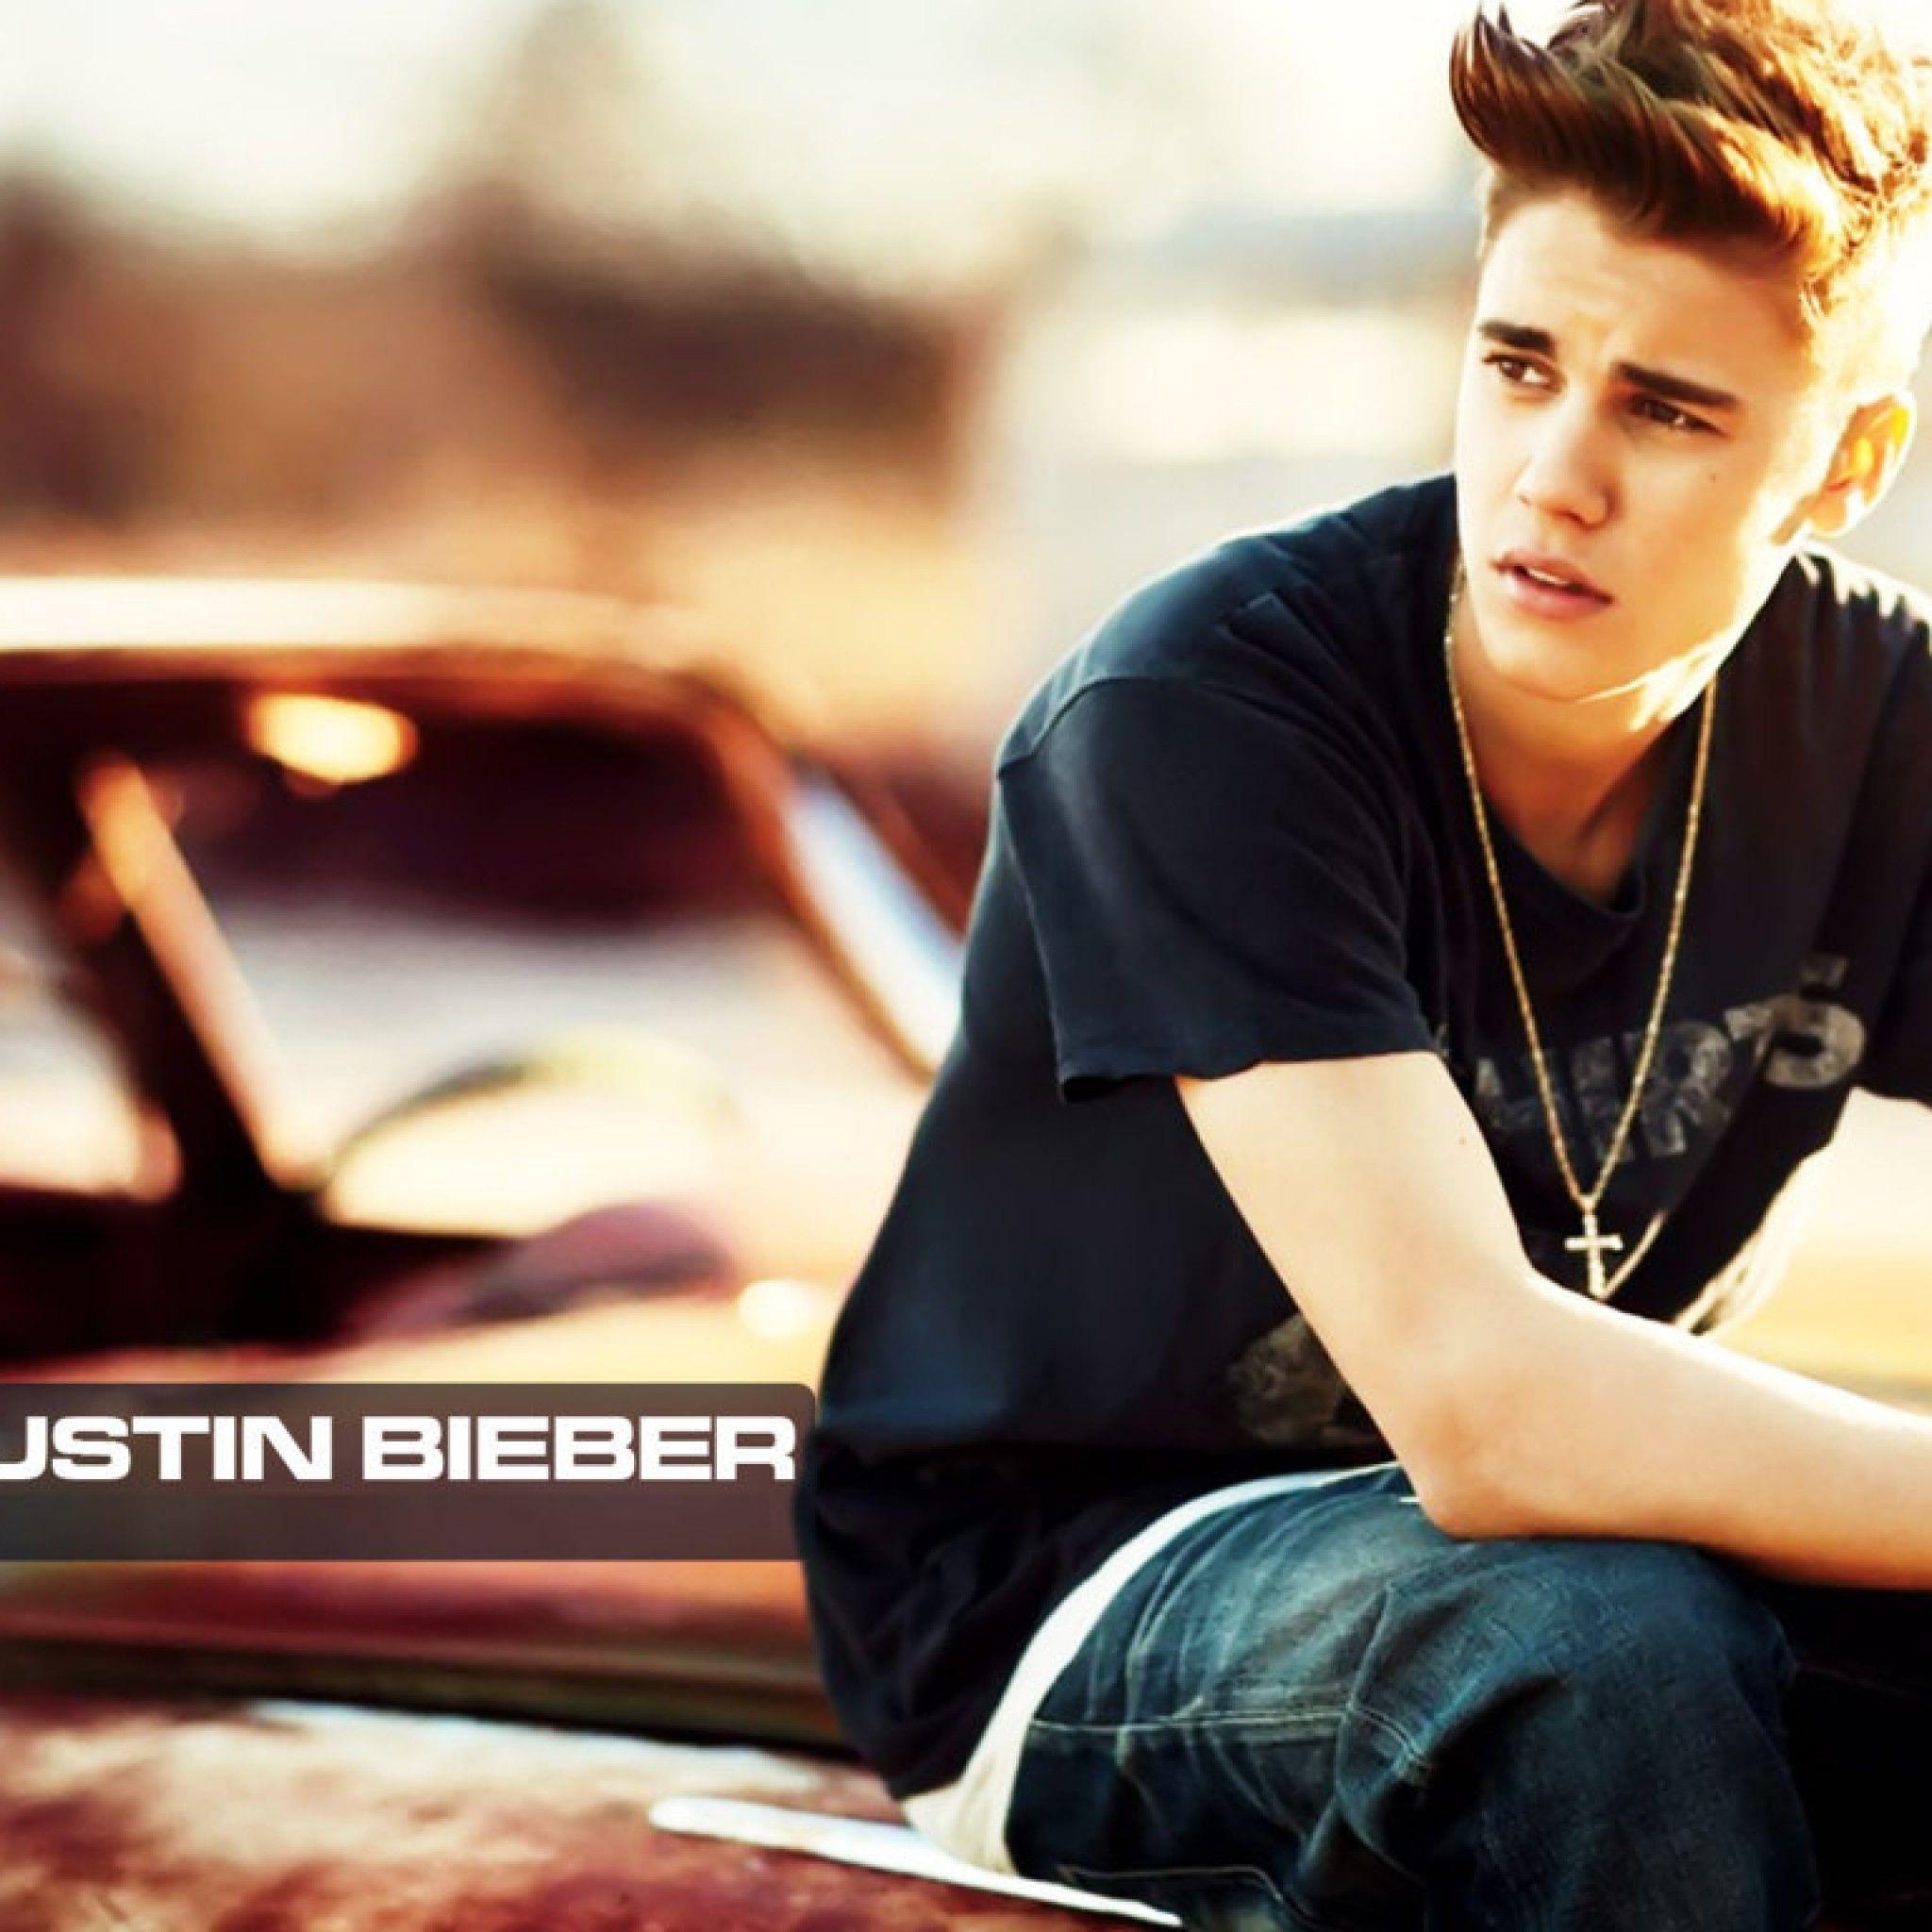 Justin Bieber Wallpapers Hd 2015 Wallpaper Cave